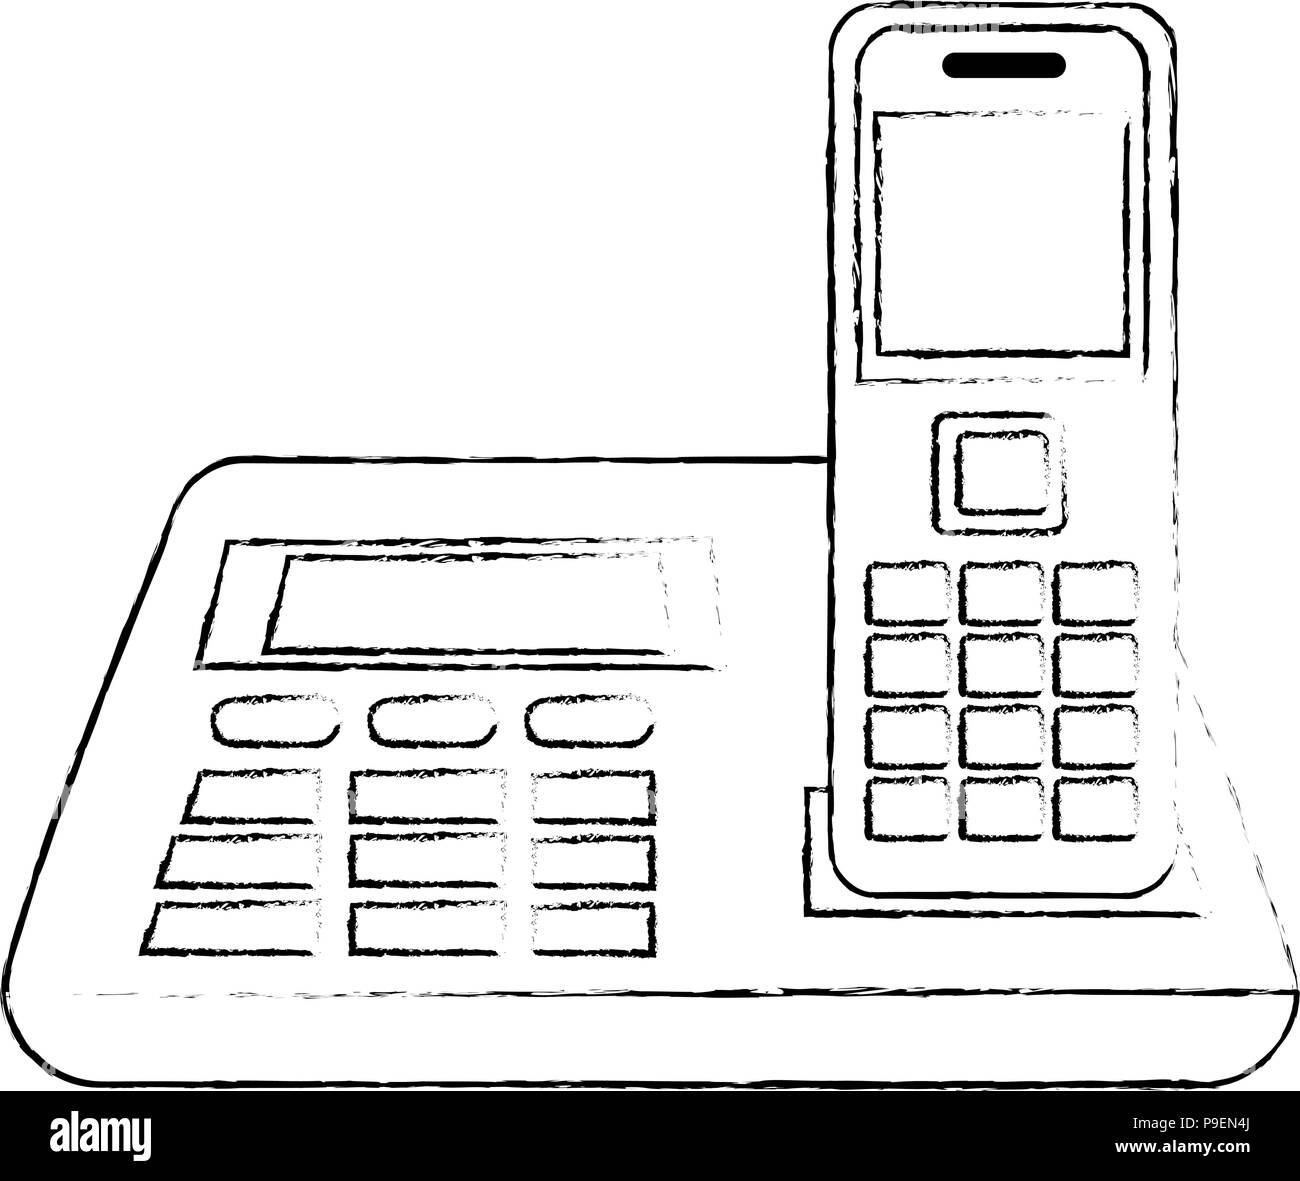 office digital telephone icon Stock Vector